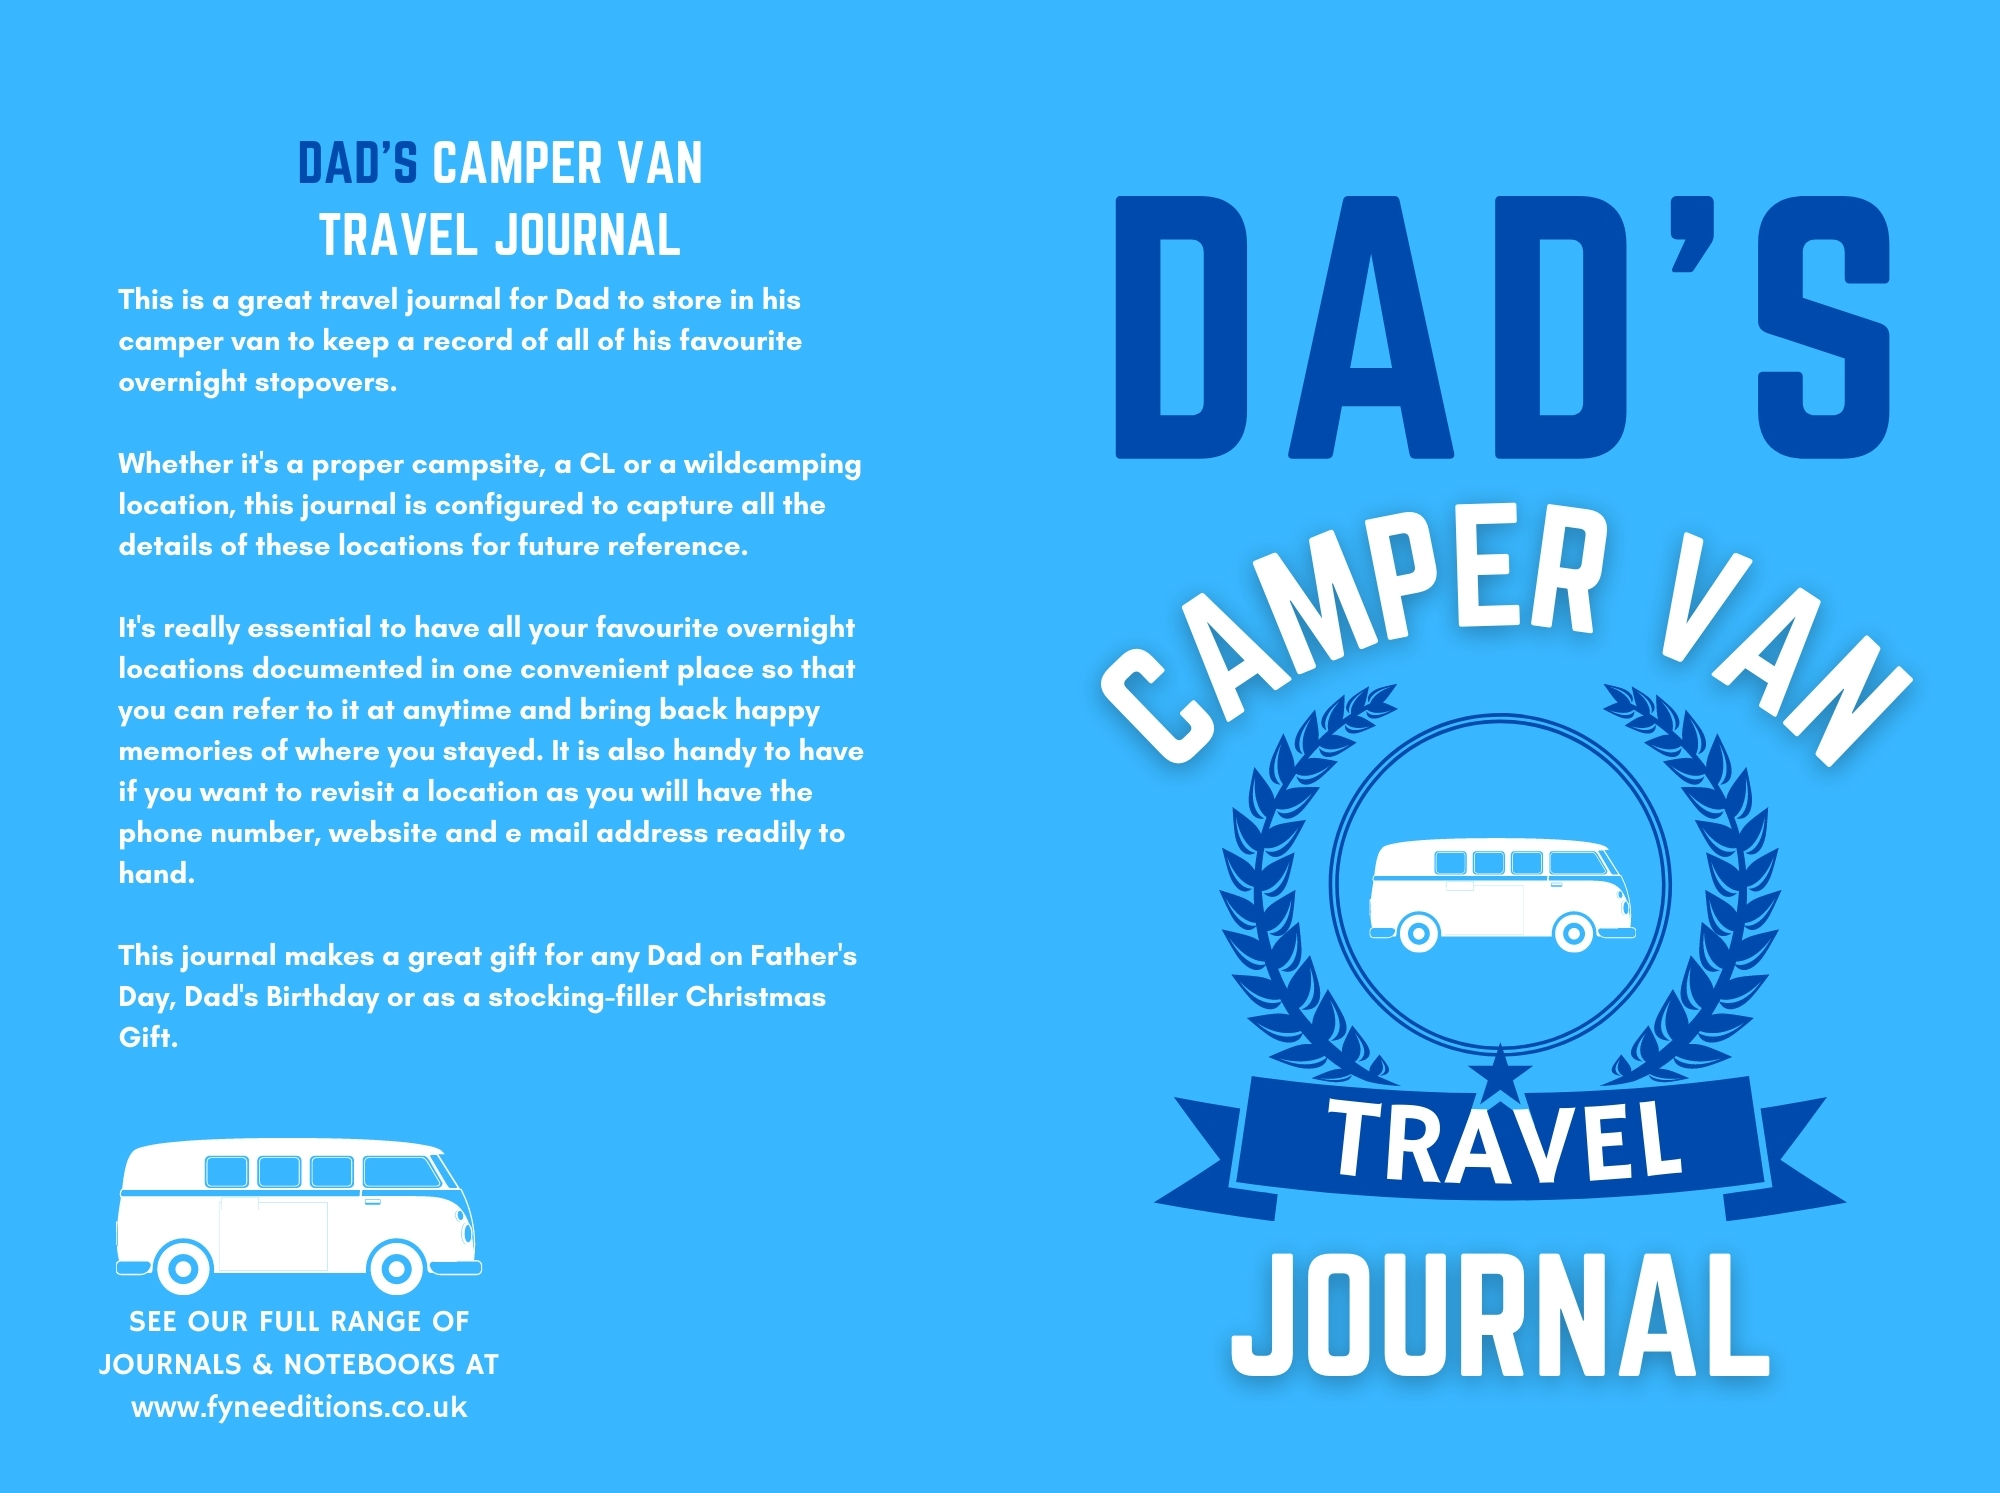 Dad's Camper Van Travel Journal - Cover